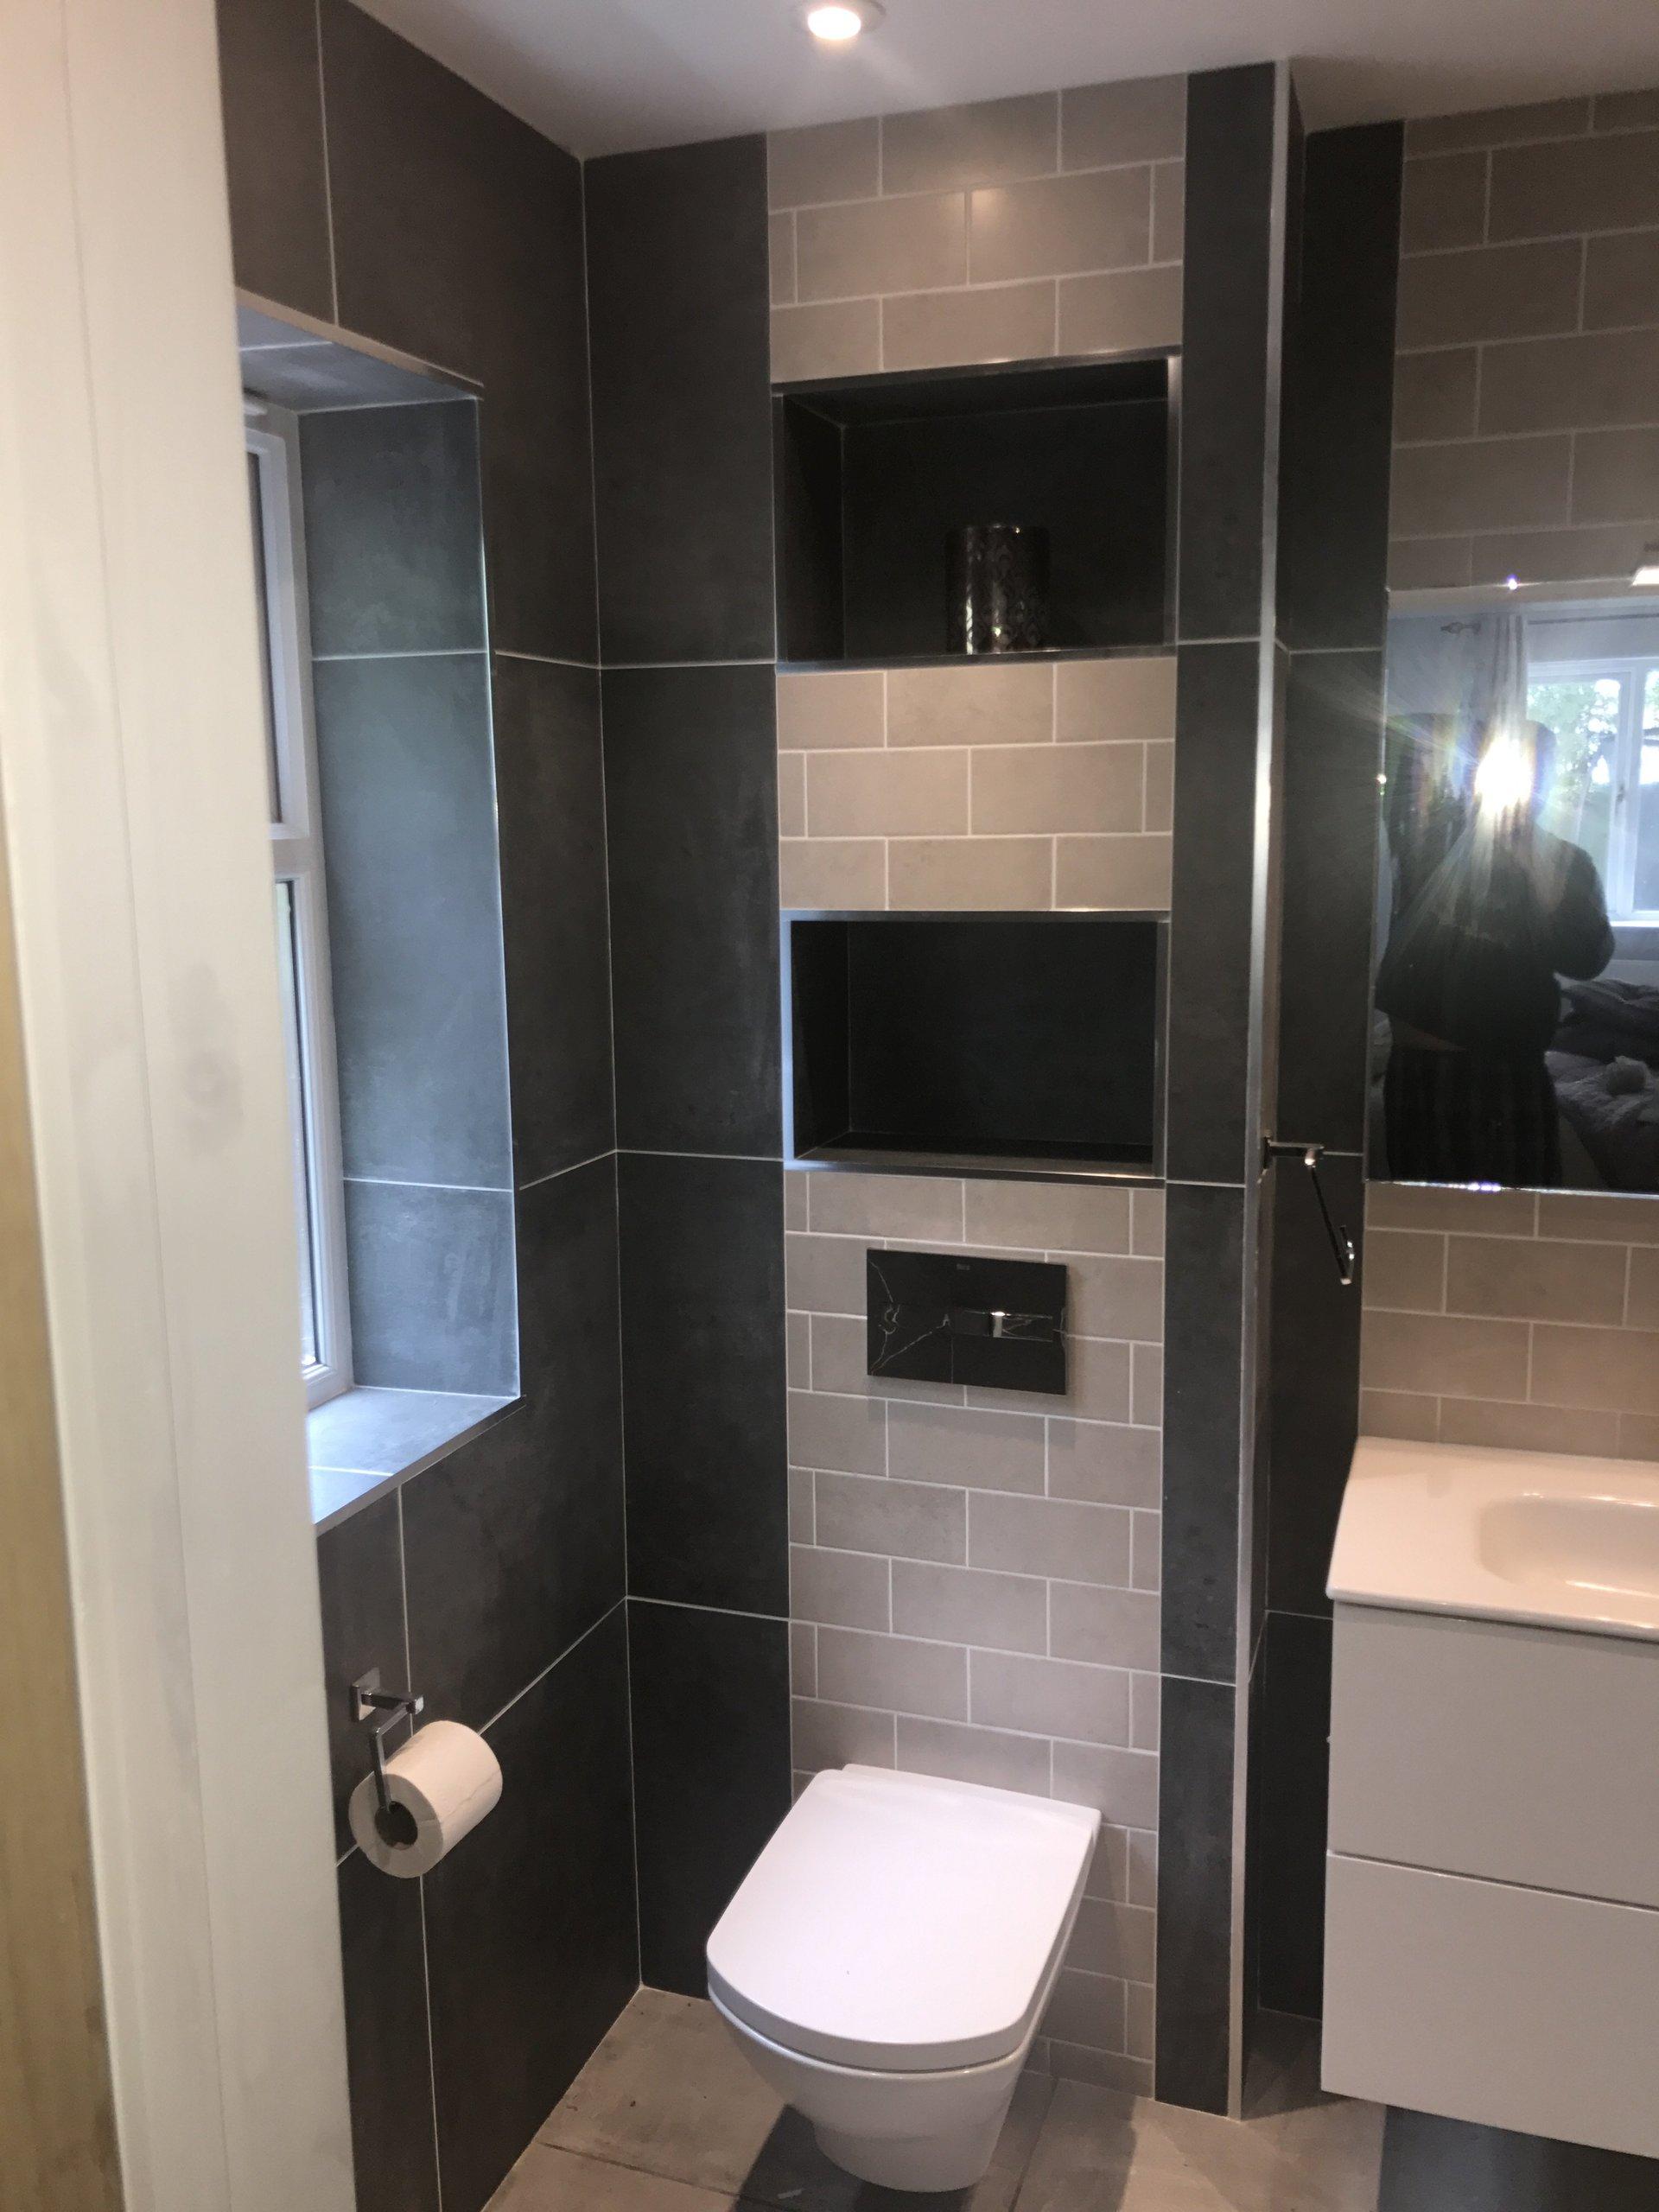 WC inside the bathroom